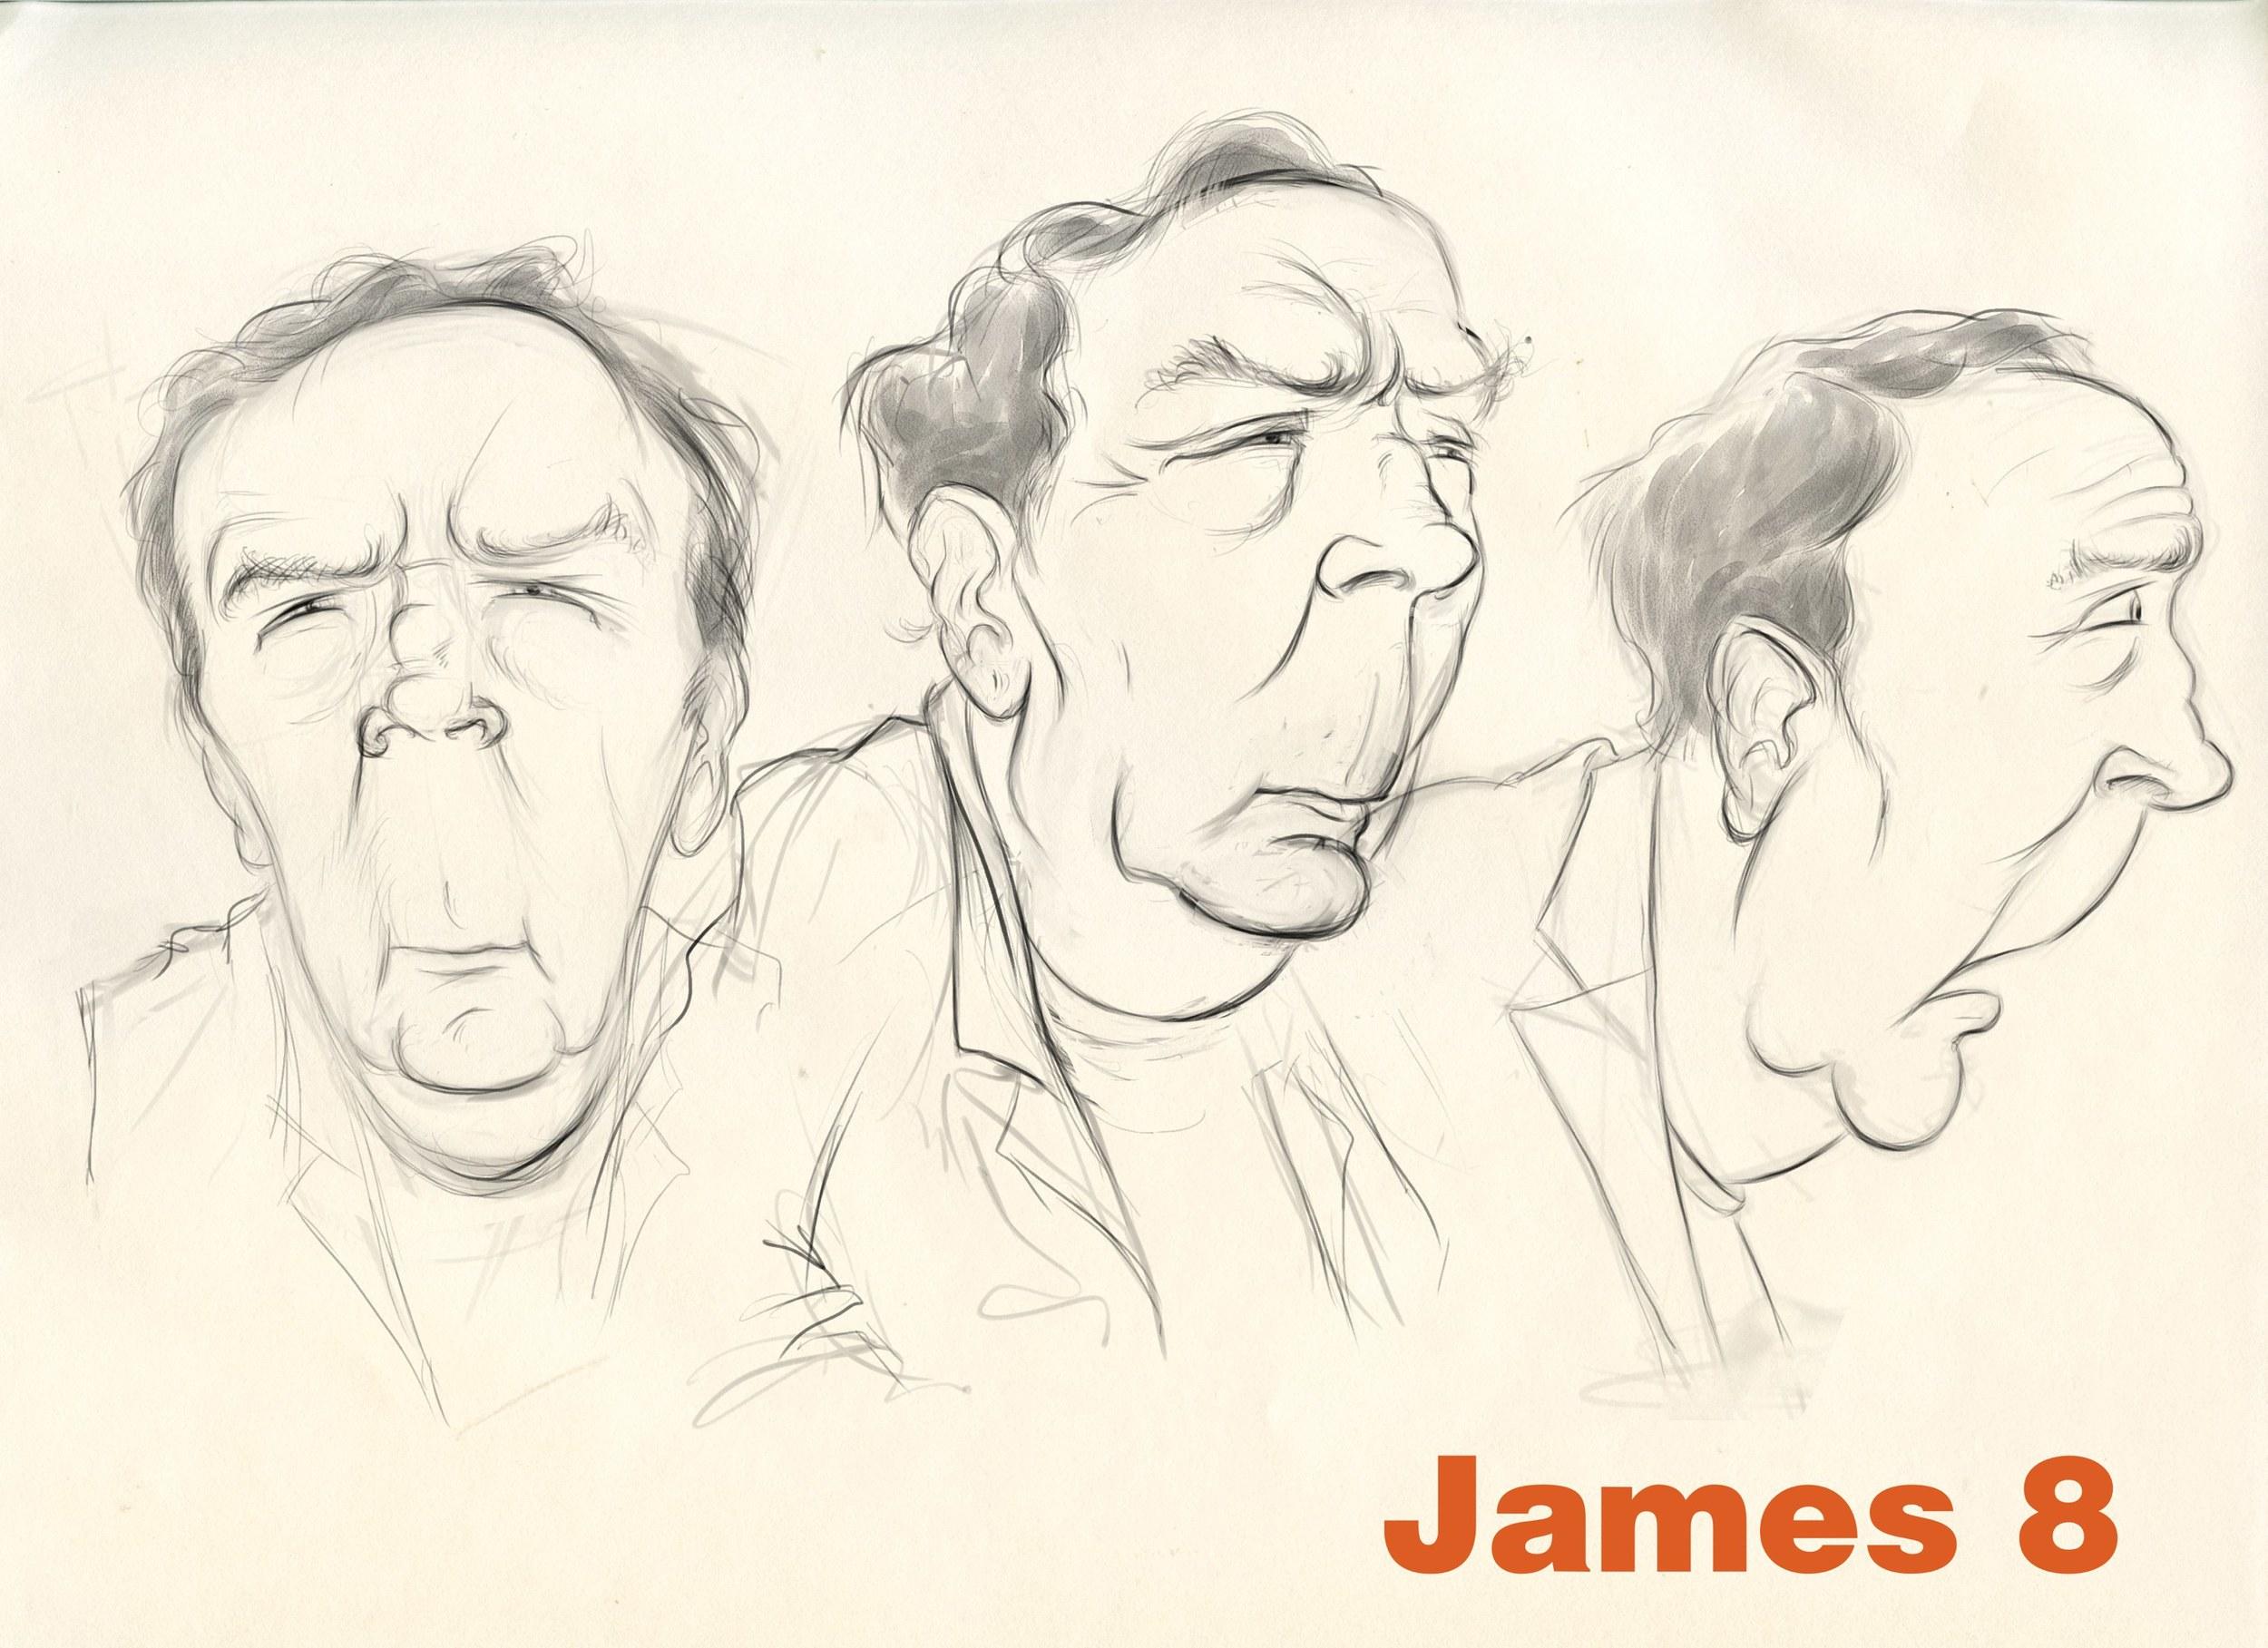 James Patterson 8 caricature.jpg